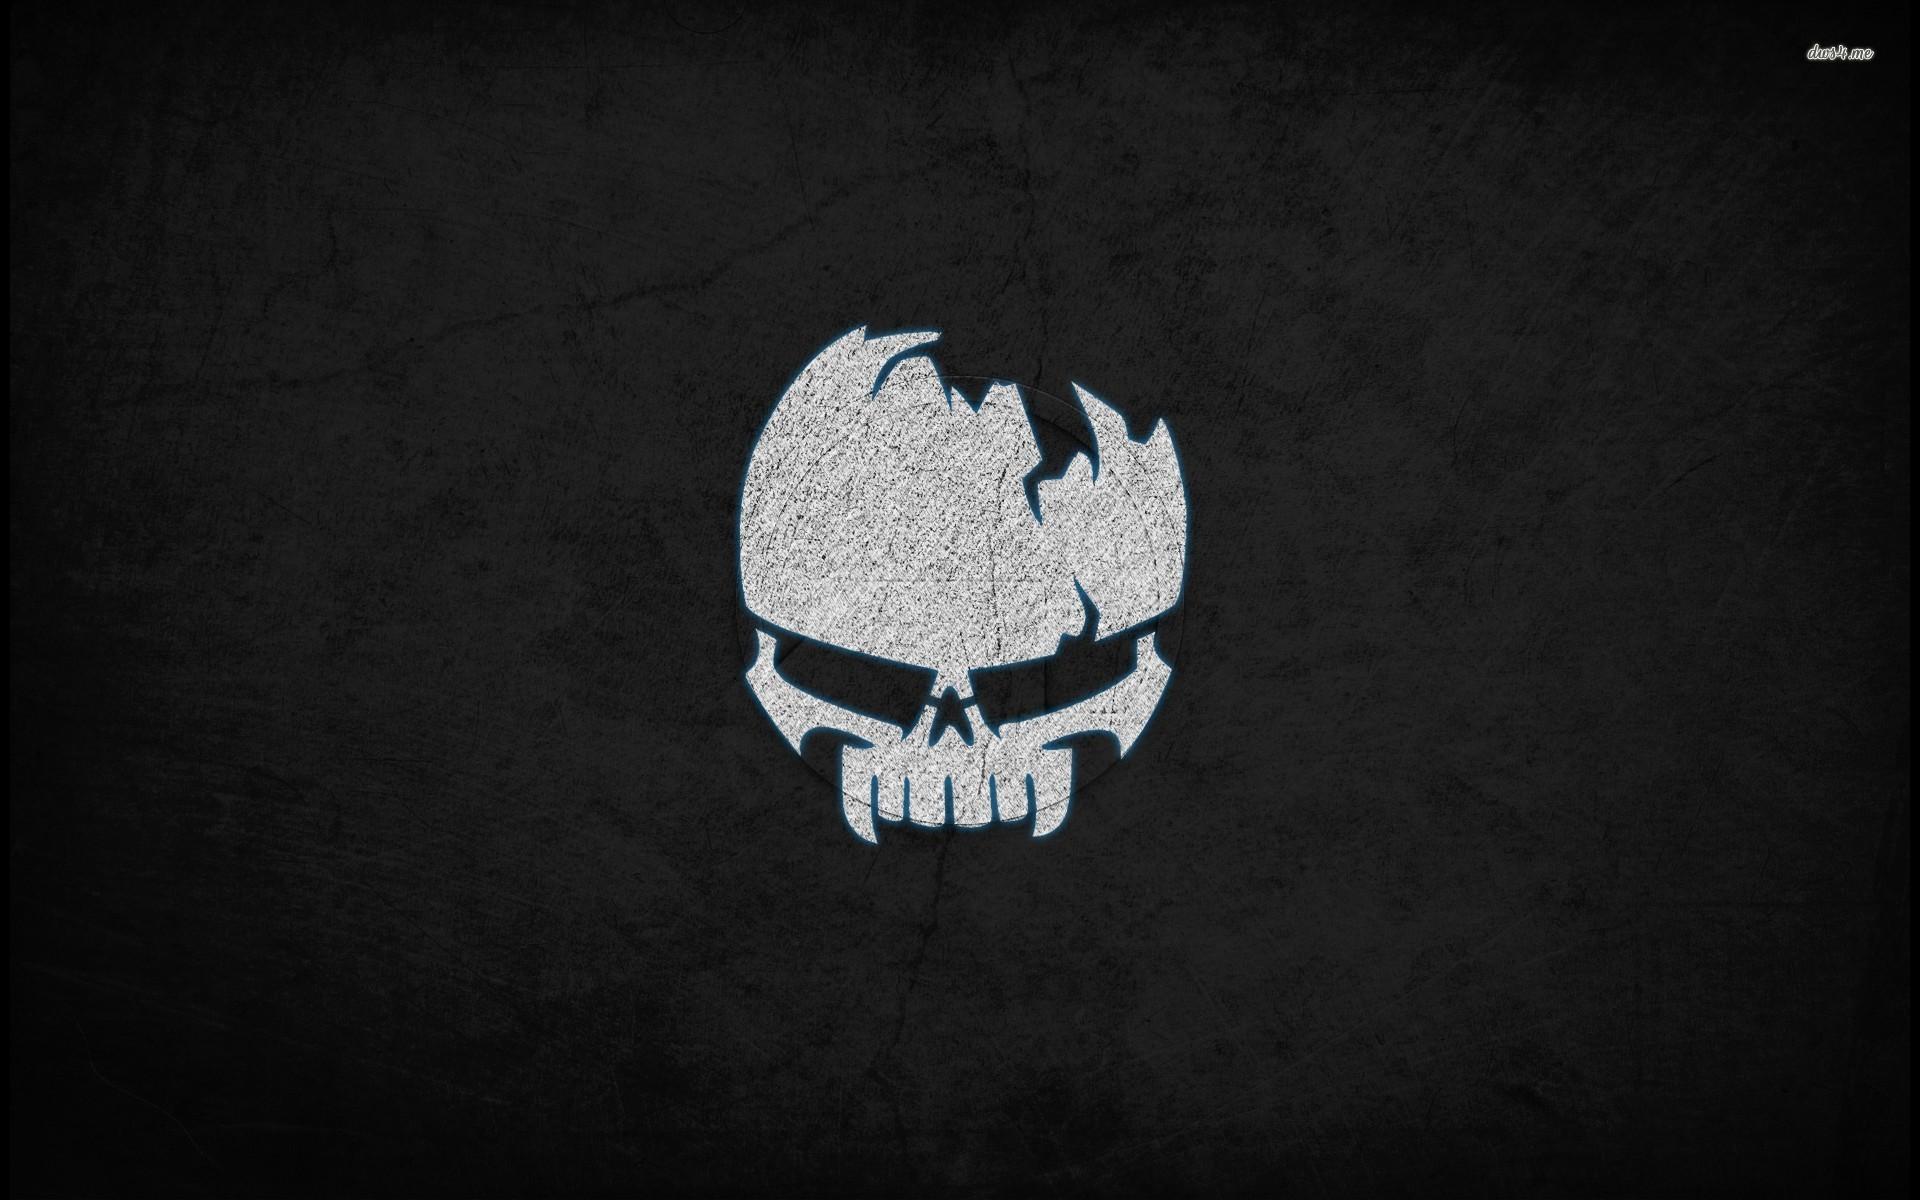 description download wallpaper titled apple skull wallpaper download 1920x1200